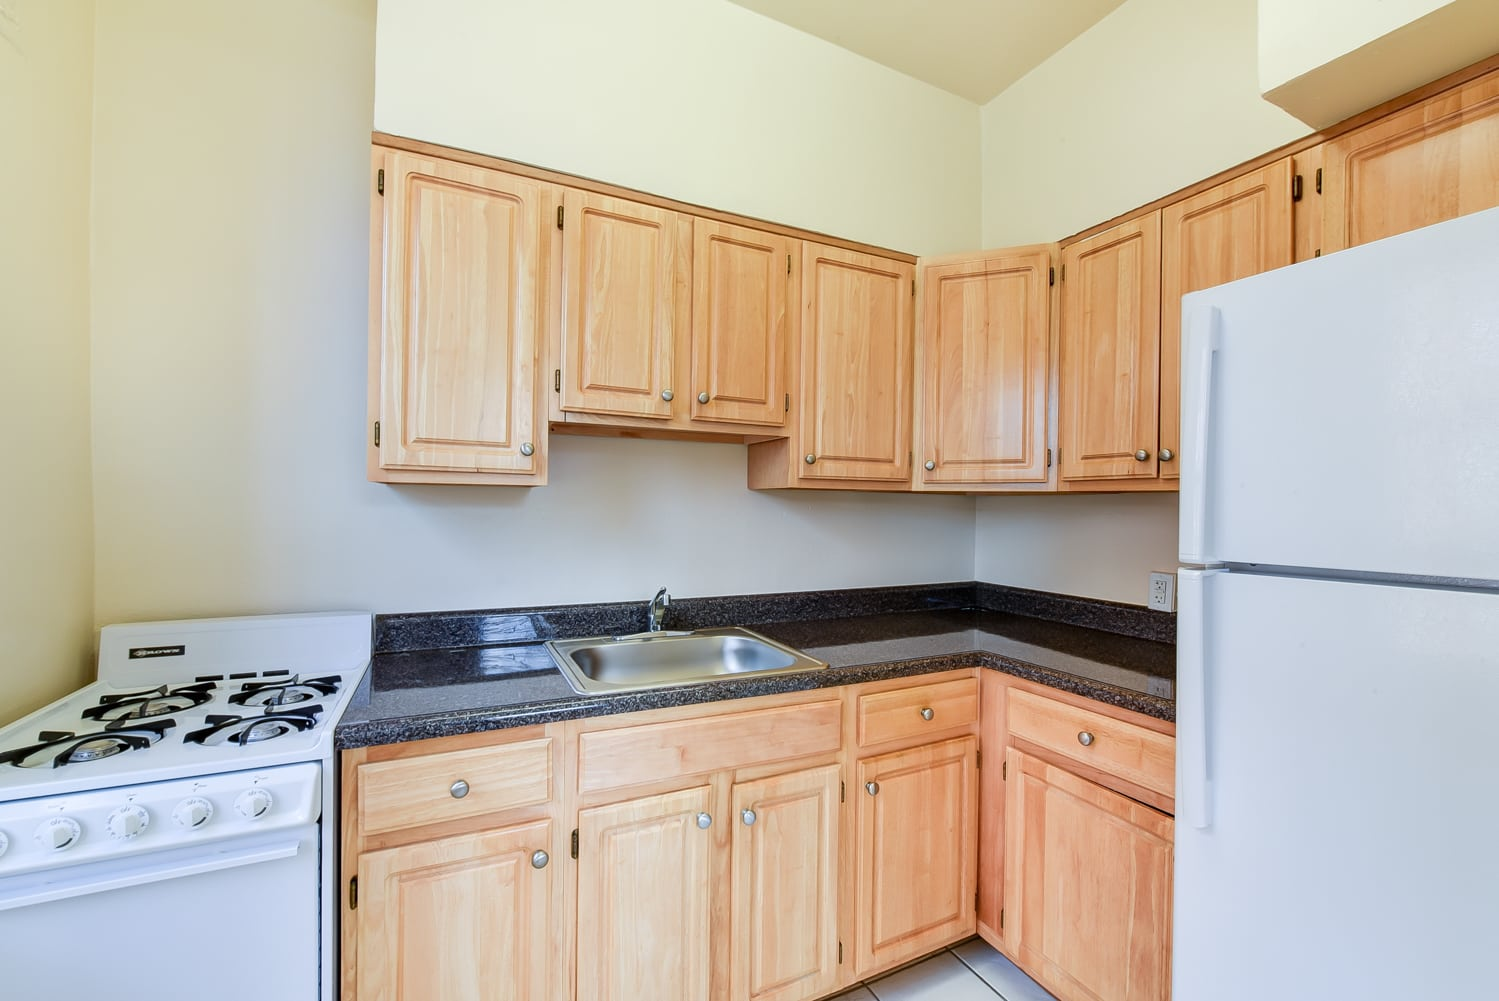 1401-Sheridan-Kitchen-Appliances-Washington-DC-Apartment ...